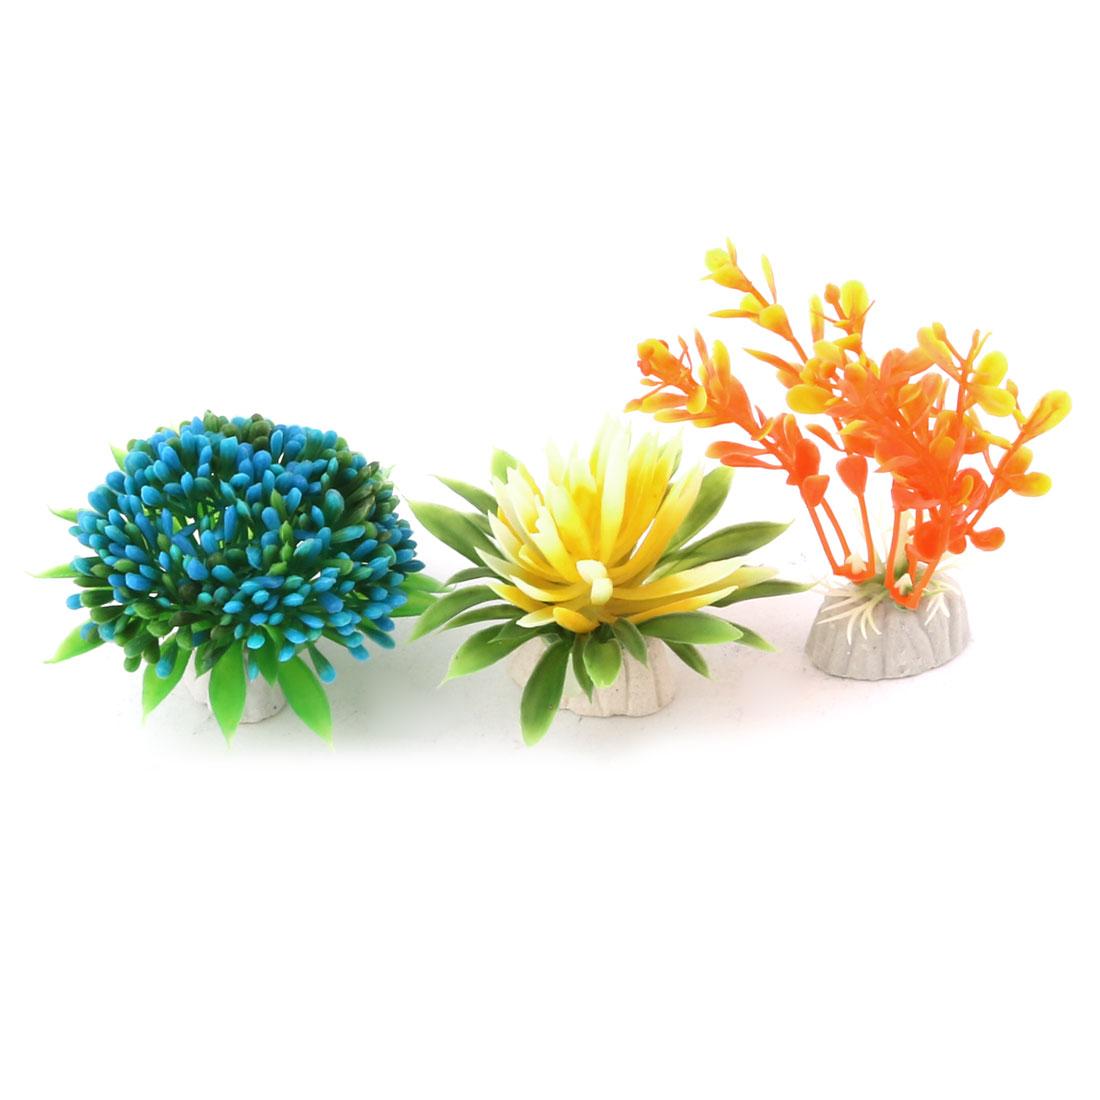 Aquarium Fish Tank Plastic Artificial Decor Emulation Plants Assorted Color 3 in 1